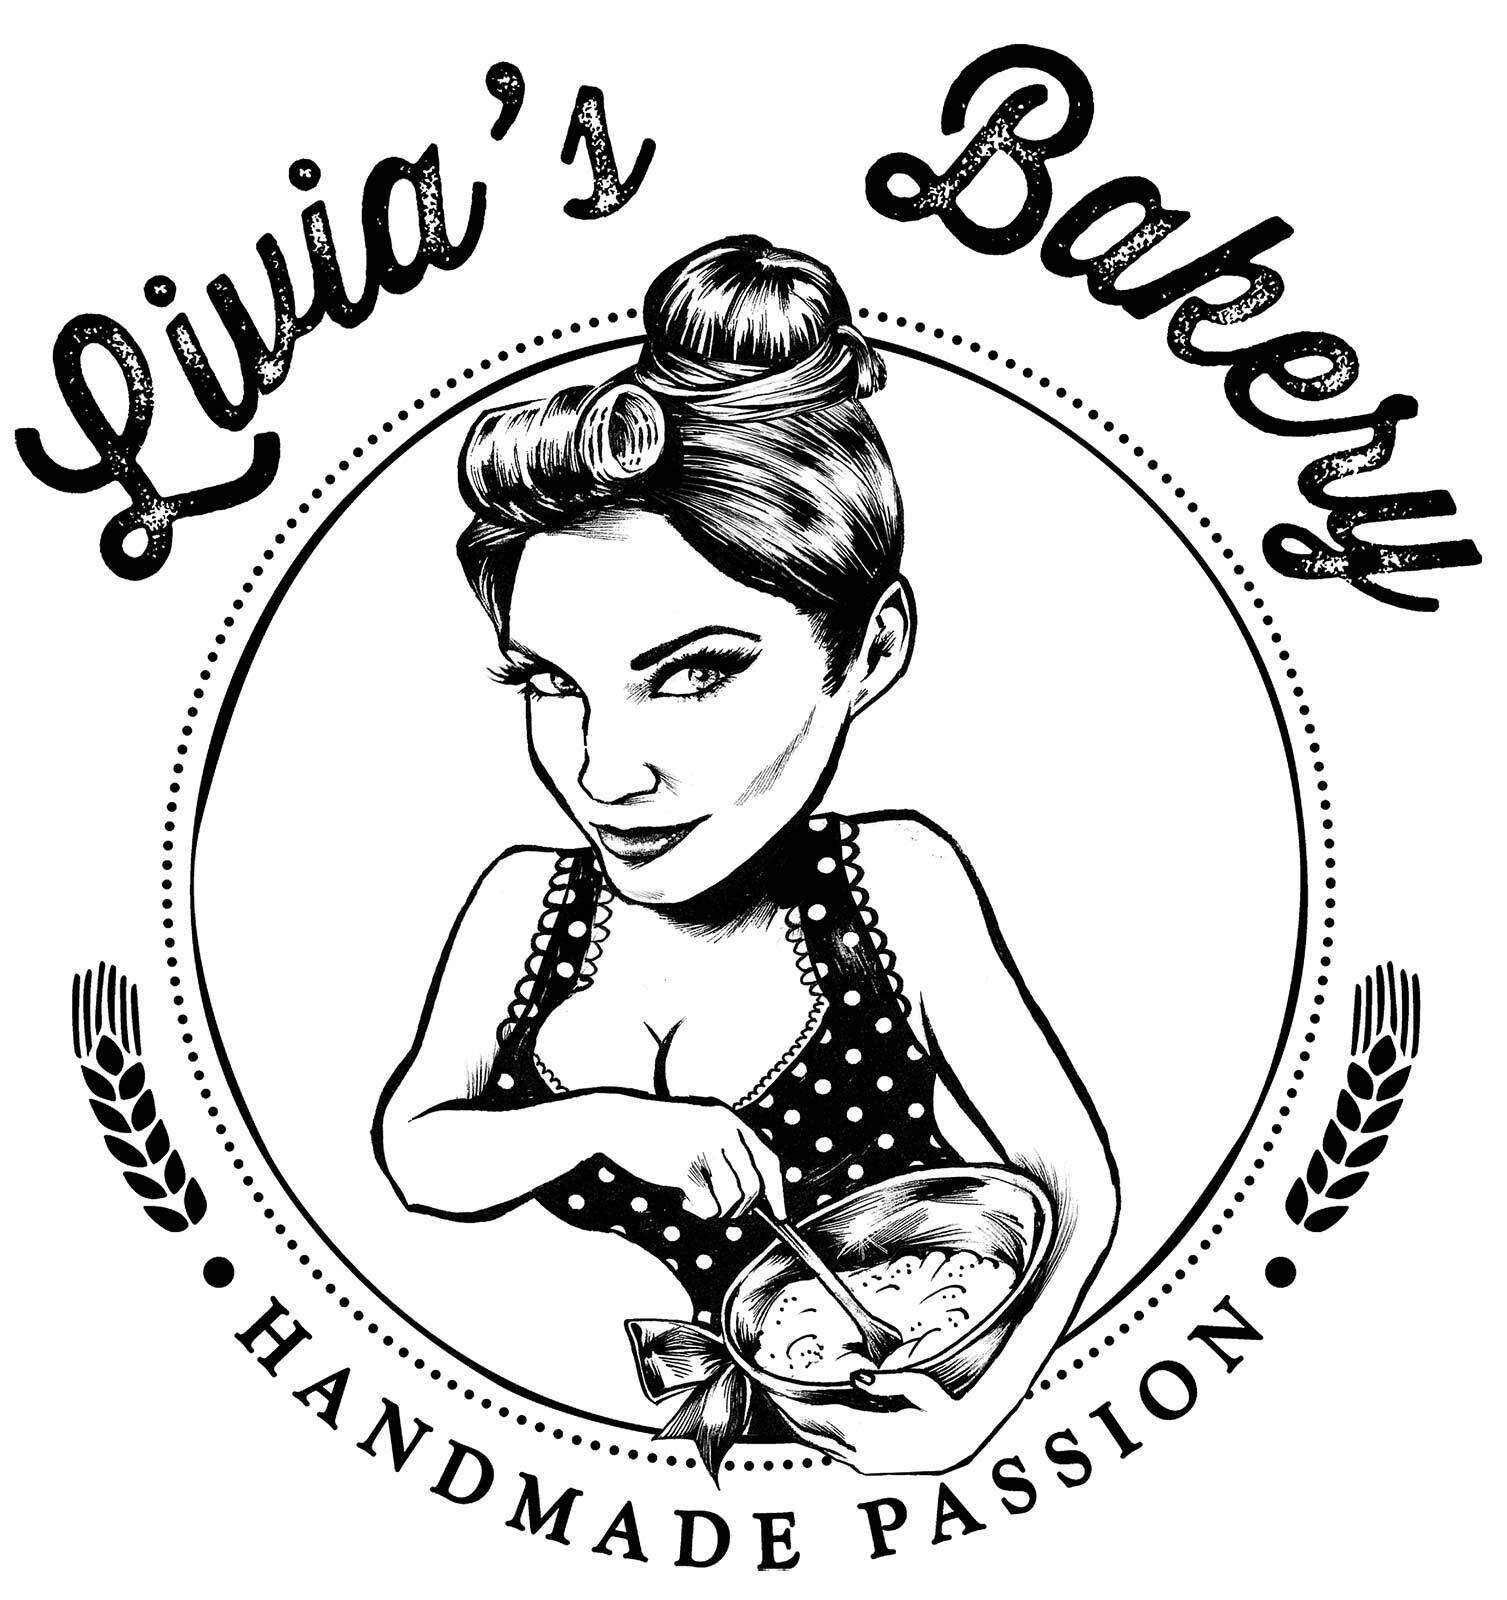 Logo livia bakery ink illustration vintage style drawing sexy - Kornel Illustration | Kornel Stadler portfolio